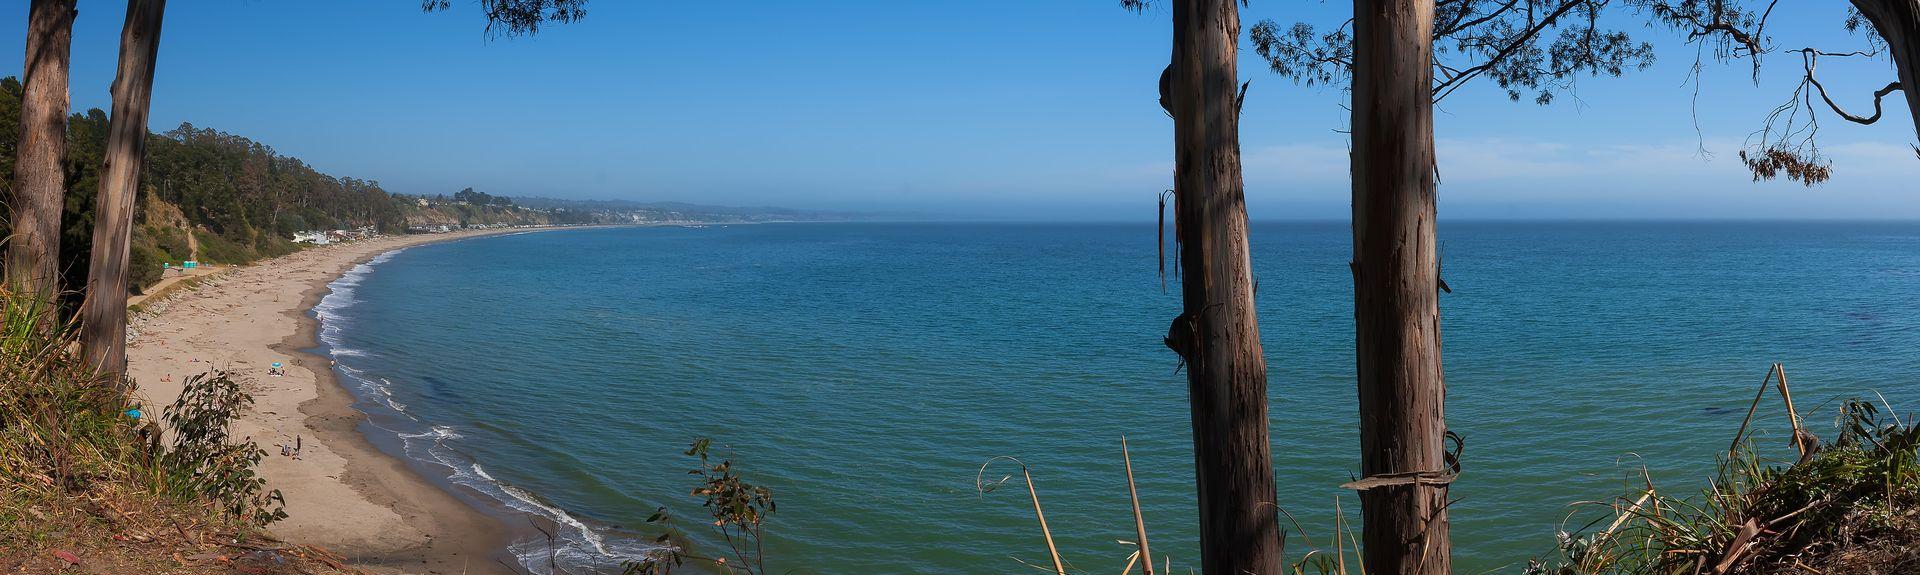 Lighthouse Point Park, Santa Cruz, CA, USA